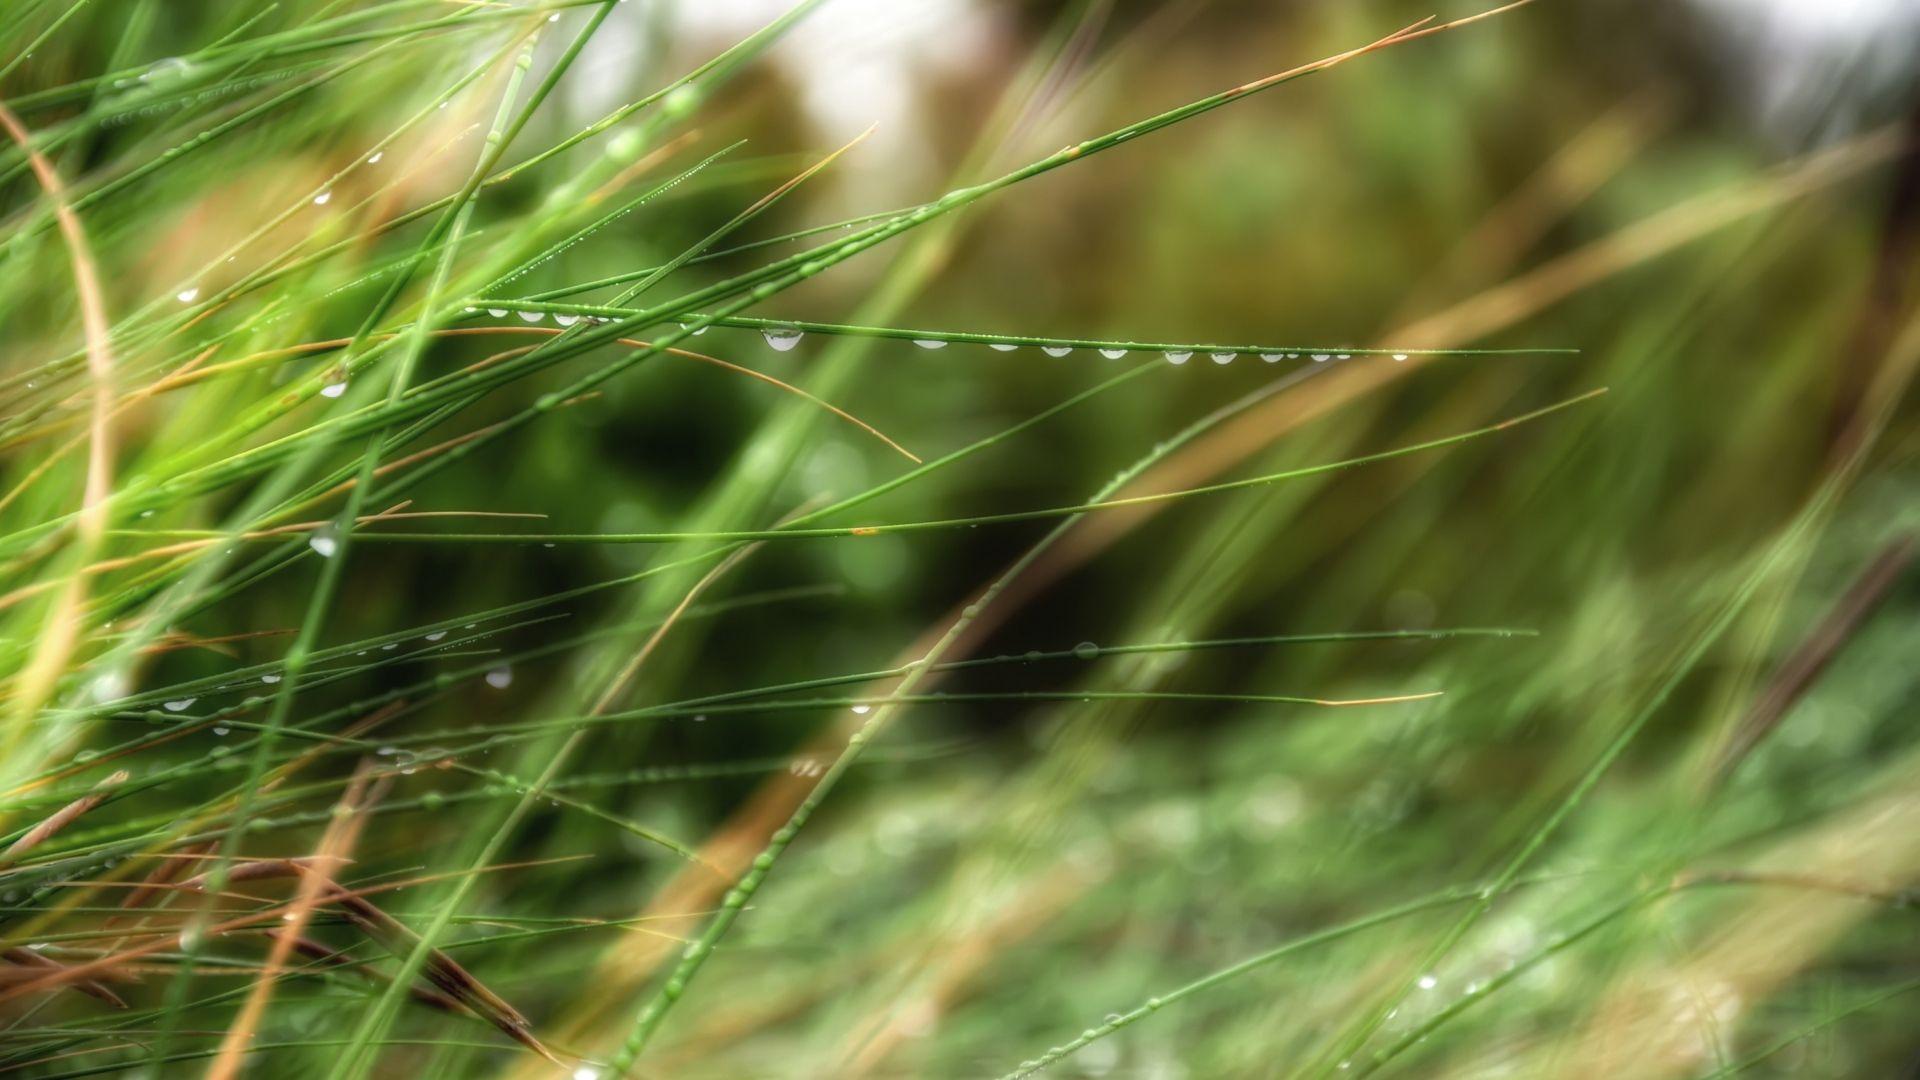 Download Wallpaper 1920x1080 Drops Grass Dew Summer Rain Full Hd 1080p Hd Background Nature Wallpaper Hd Backgrounds Church Backgrounds